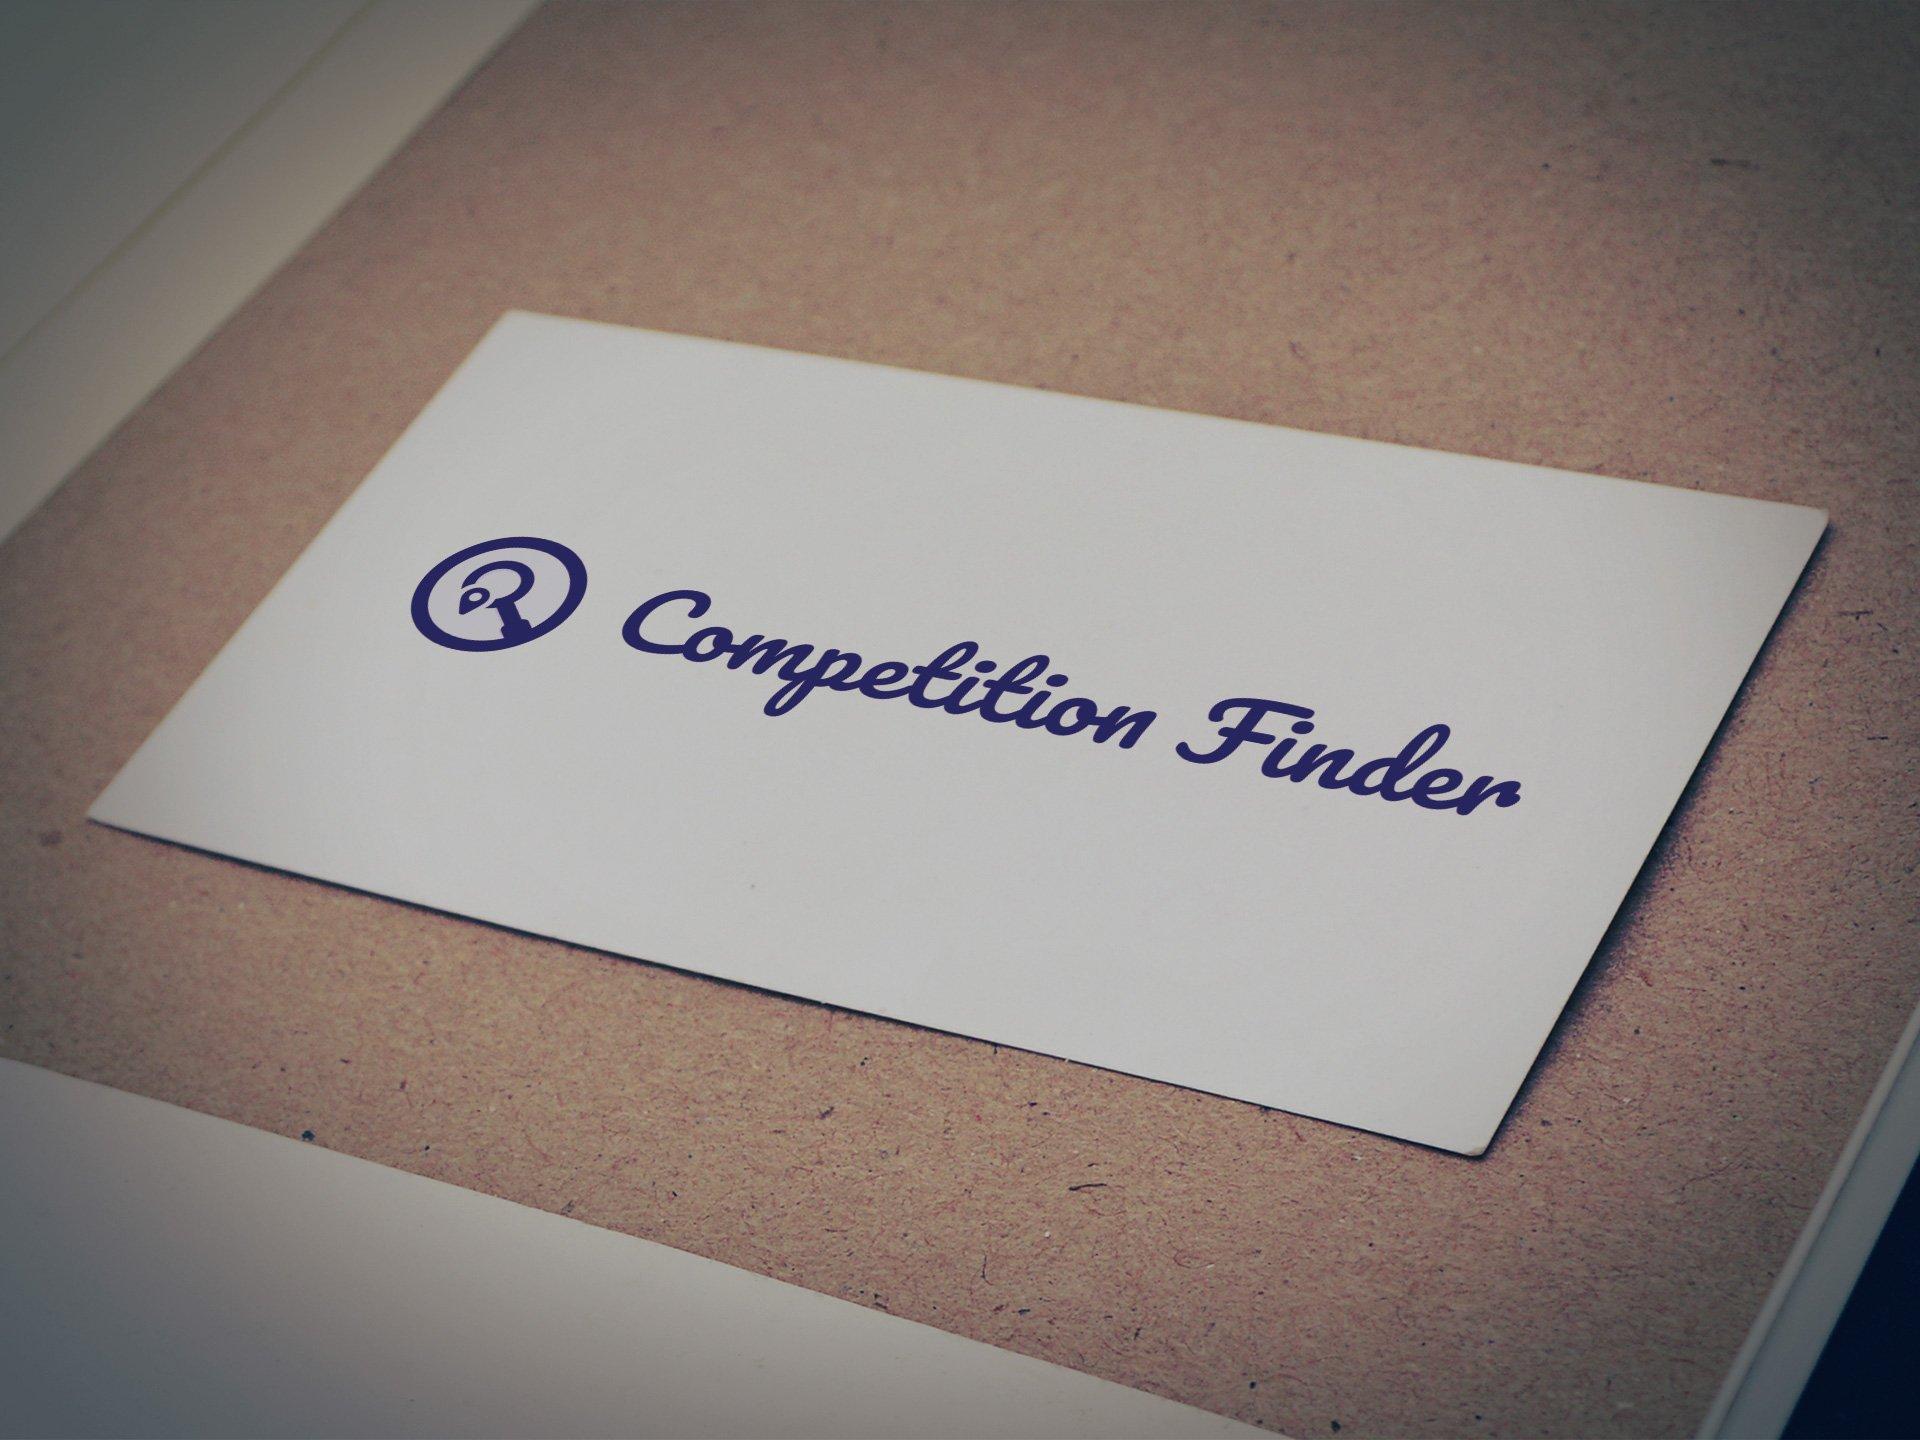 Competition Finder Logo - Designed by Casper Creative